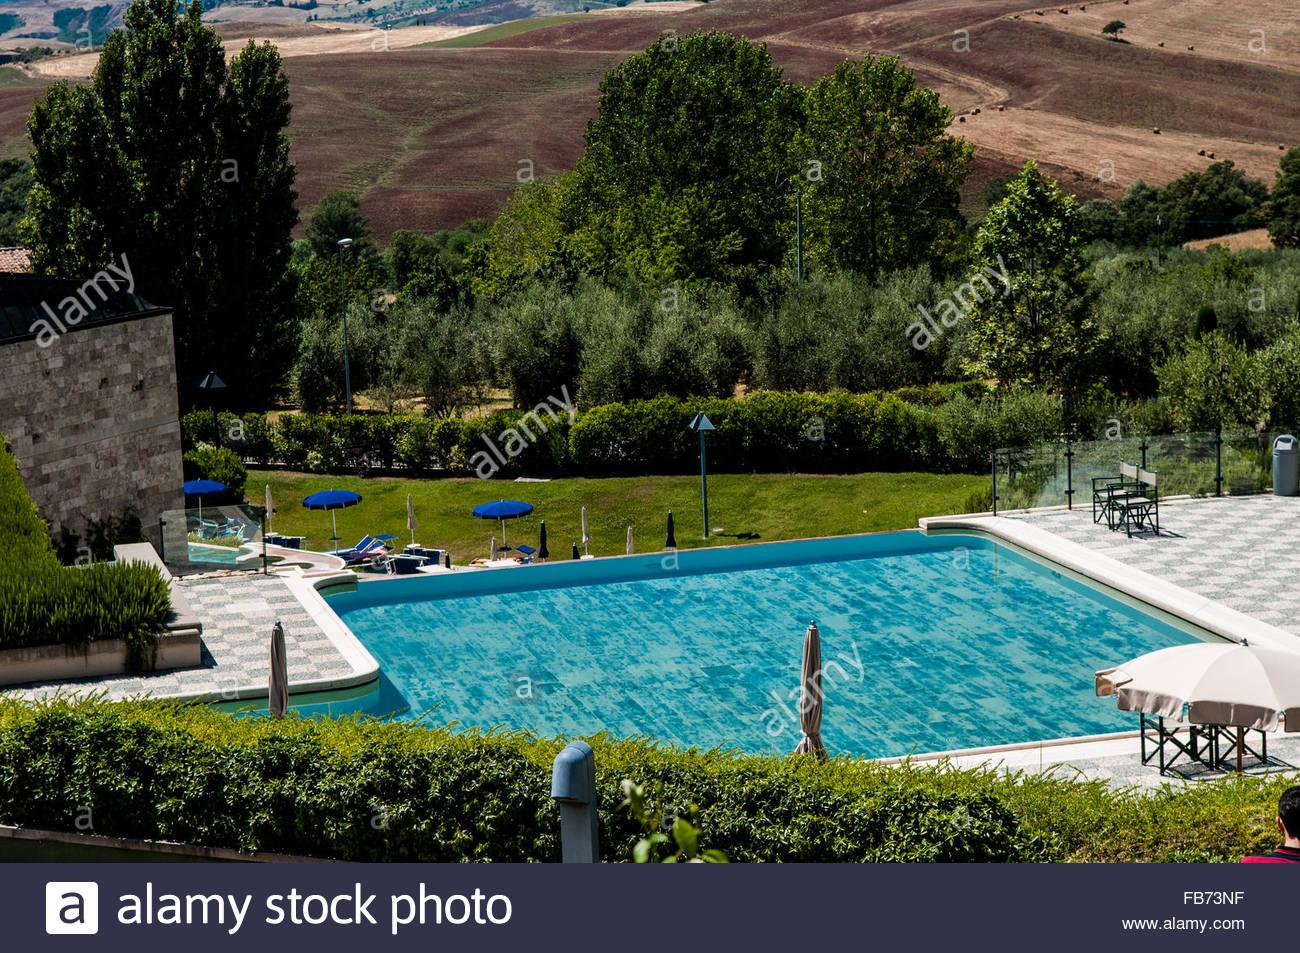 Pool fonteverde terme san casciano dei bagni italy stock photo royalty free image 92969675 alamy - San casciano dei bagni hotel ...